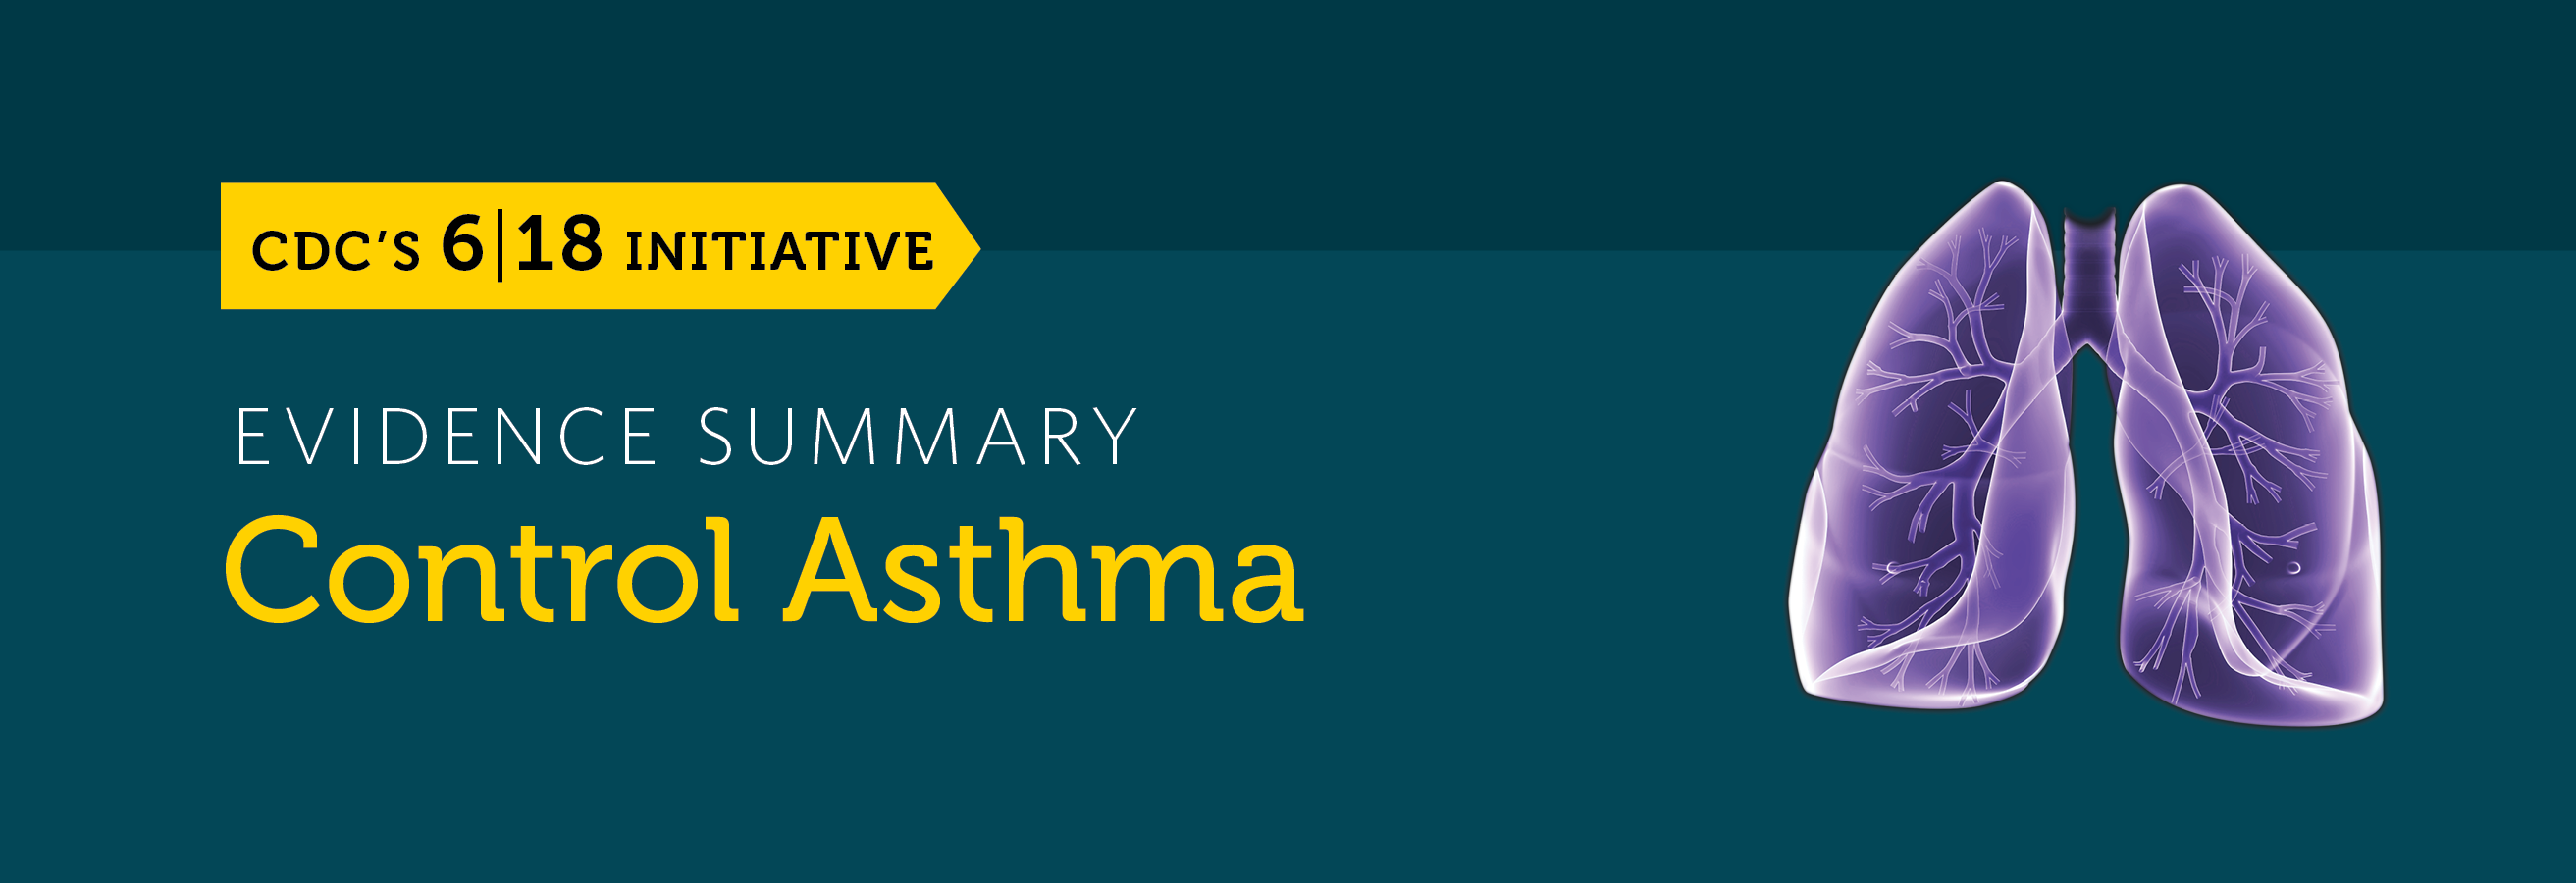 The control asthma evidence summary banner.